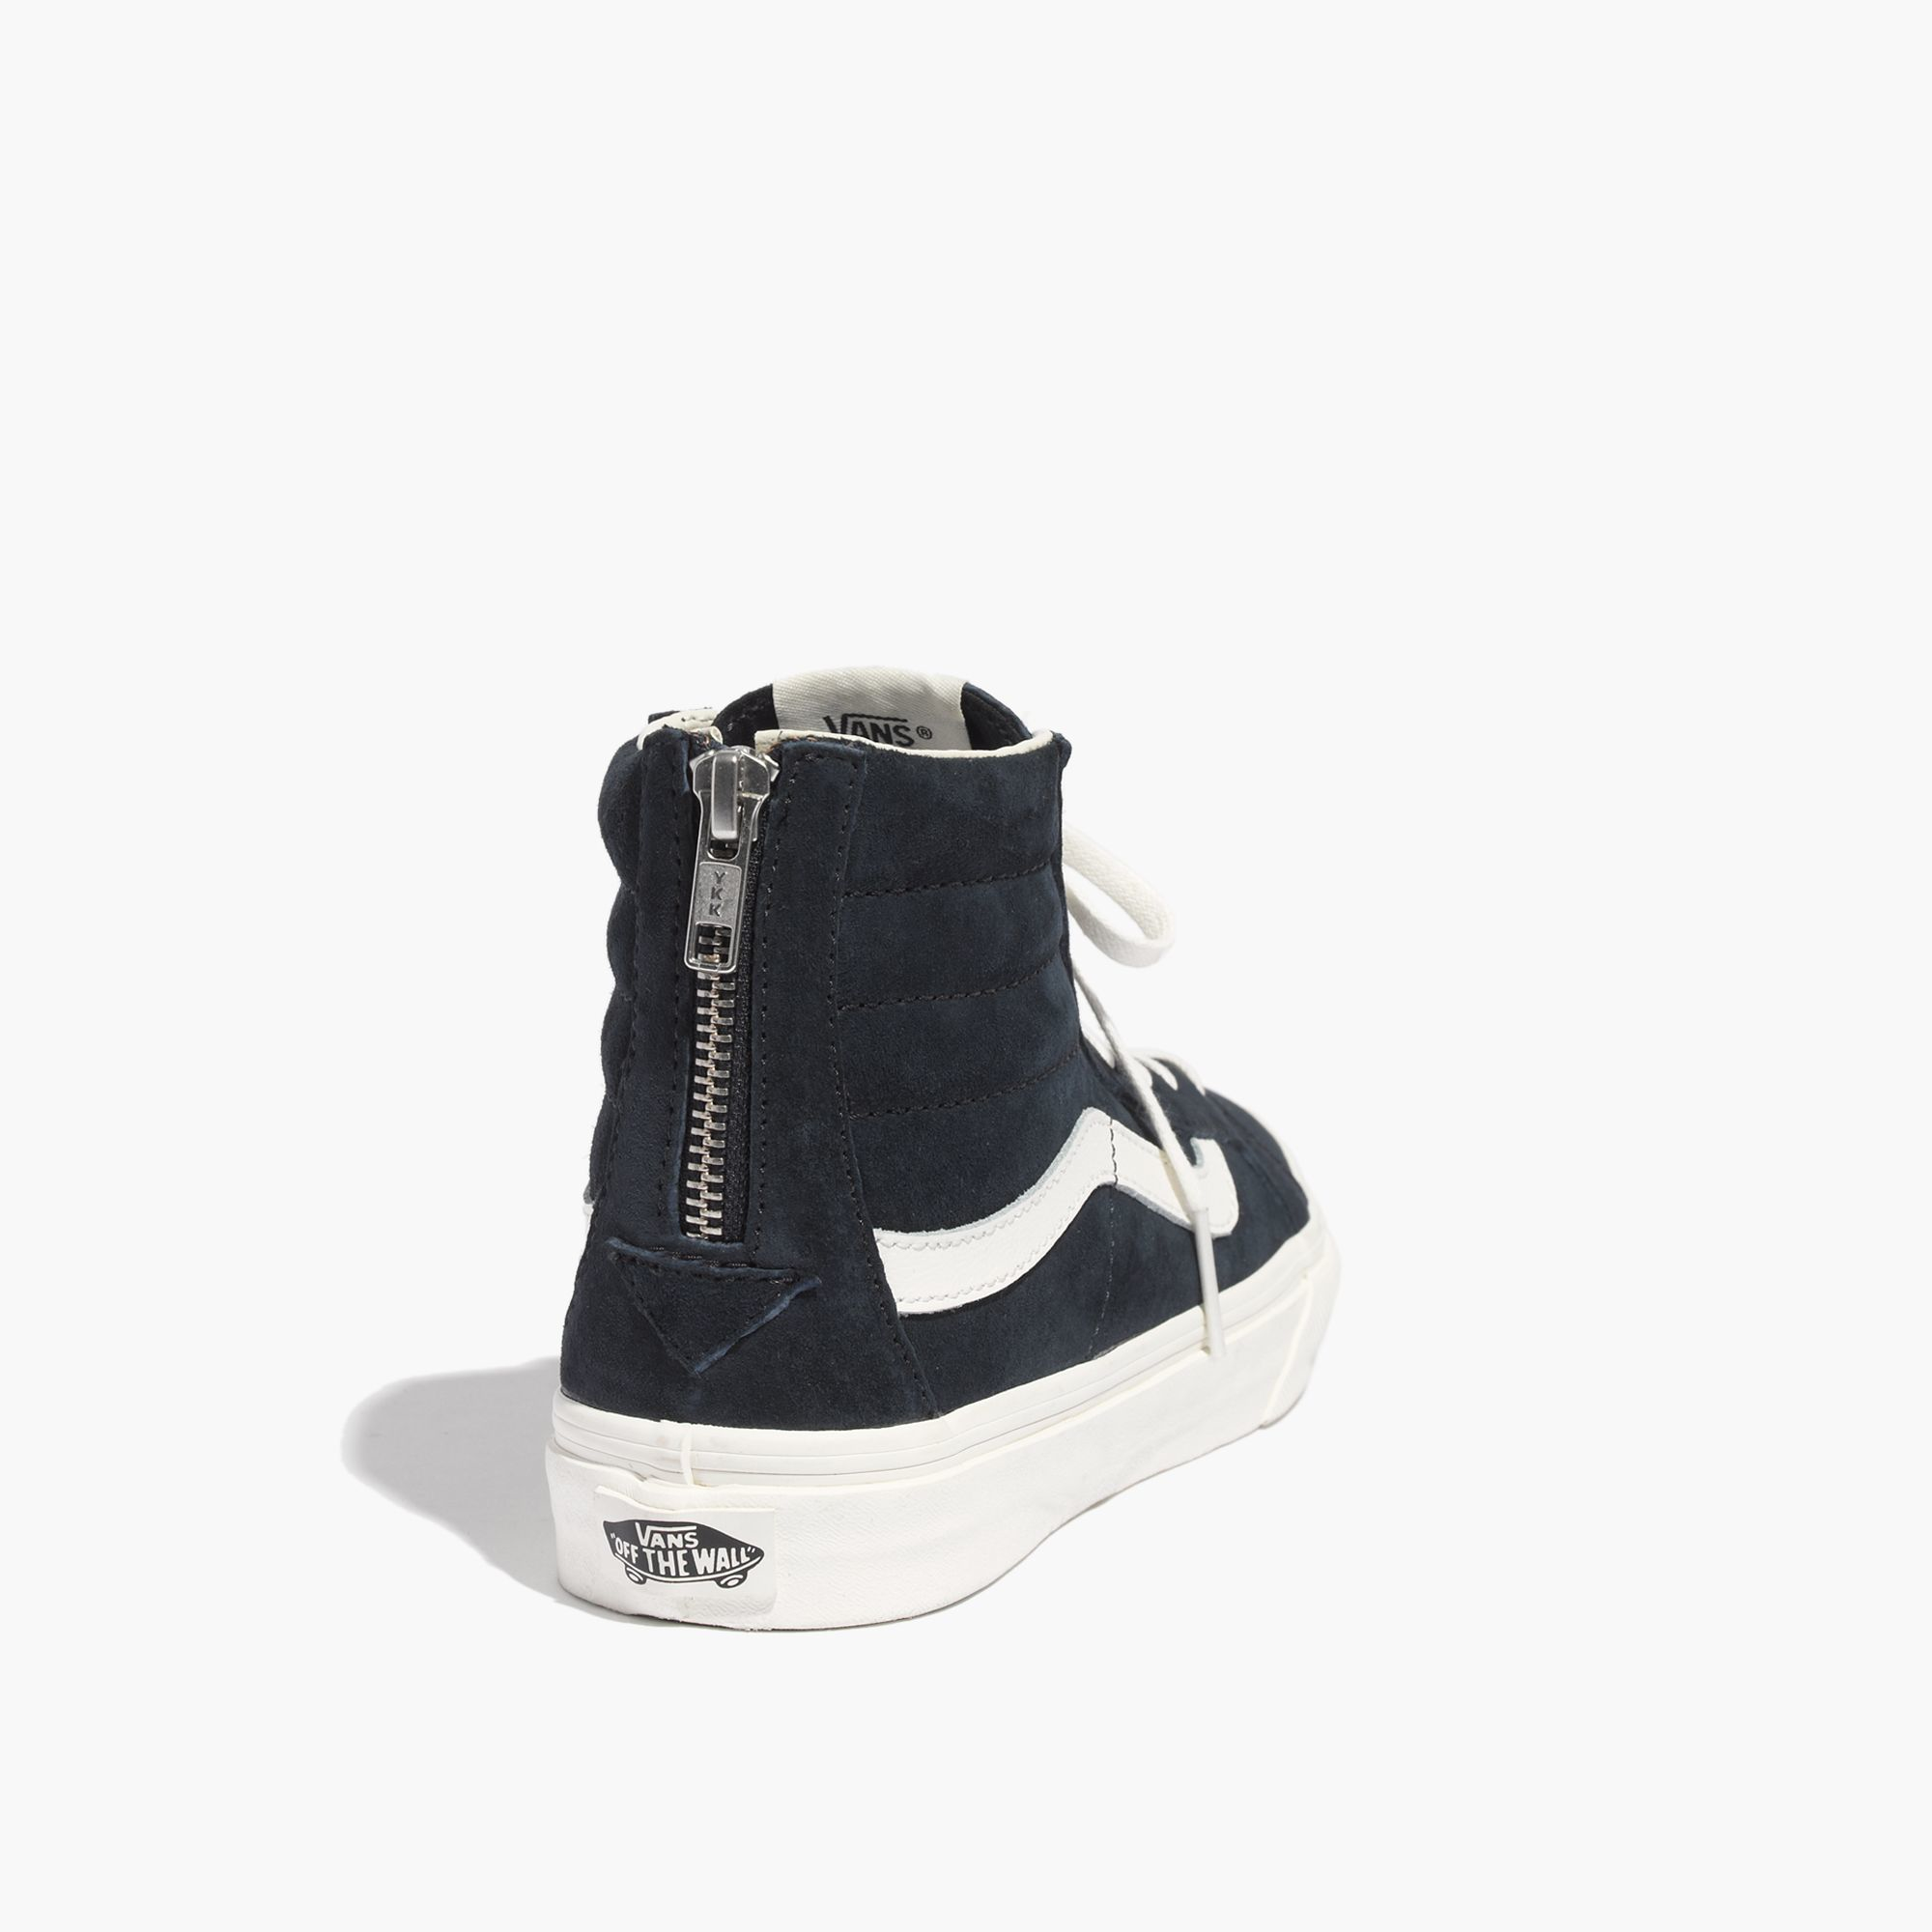 Lyst - Madewell Vans® Sk8-Hi Slim Zip High-Top Sneakers In Navy ... ba45c5b2e